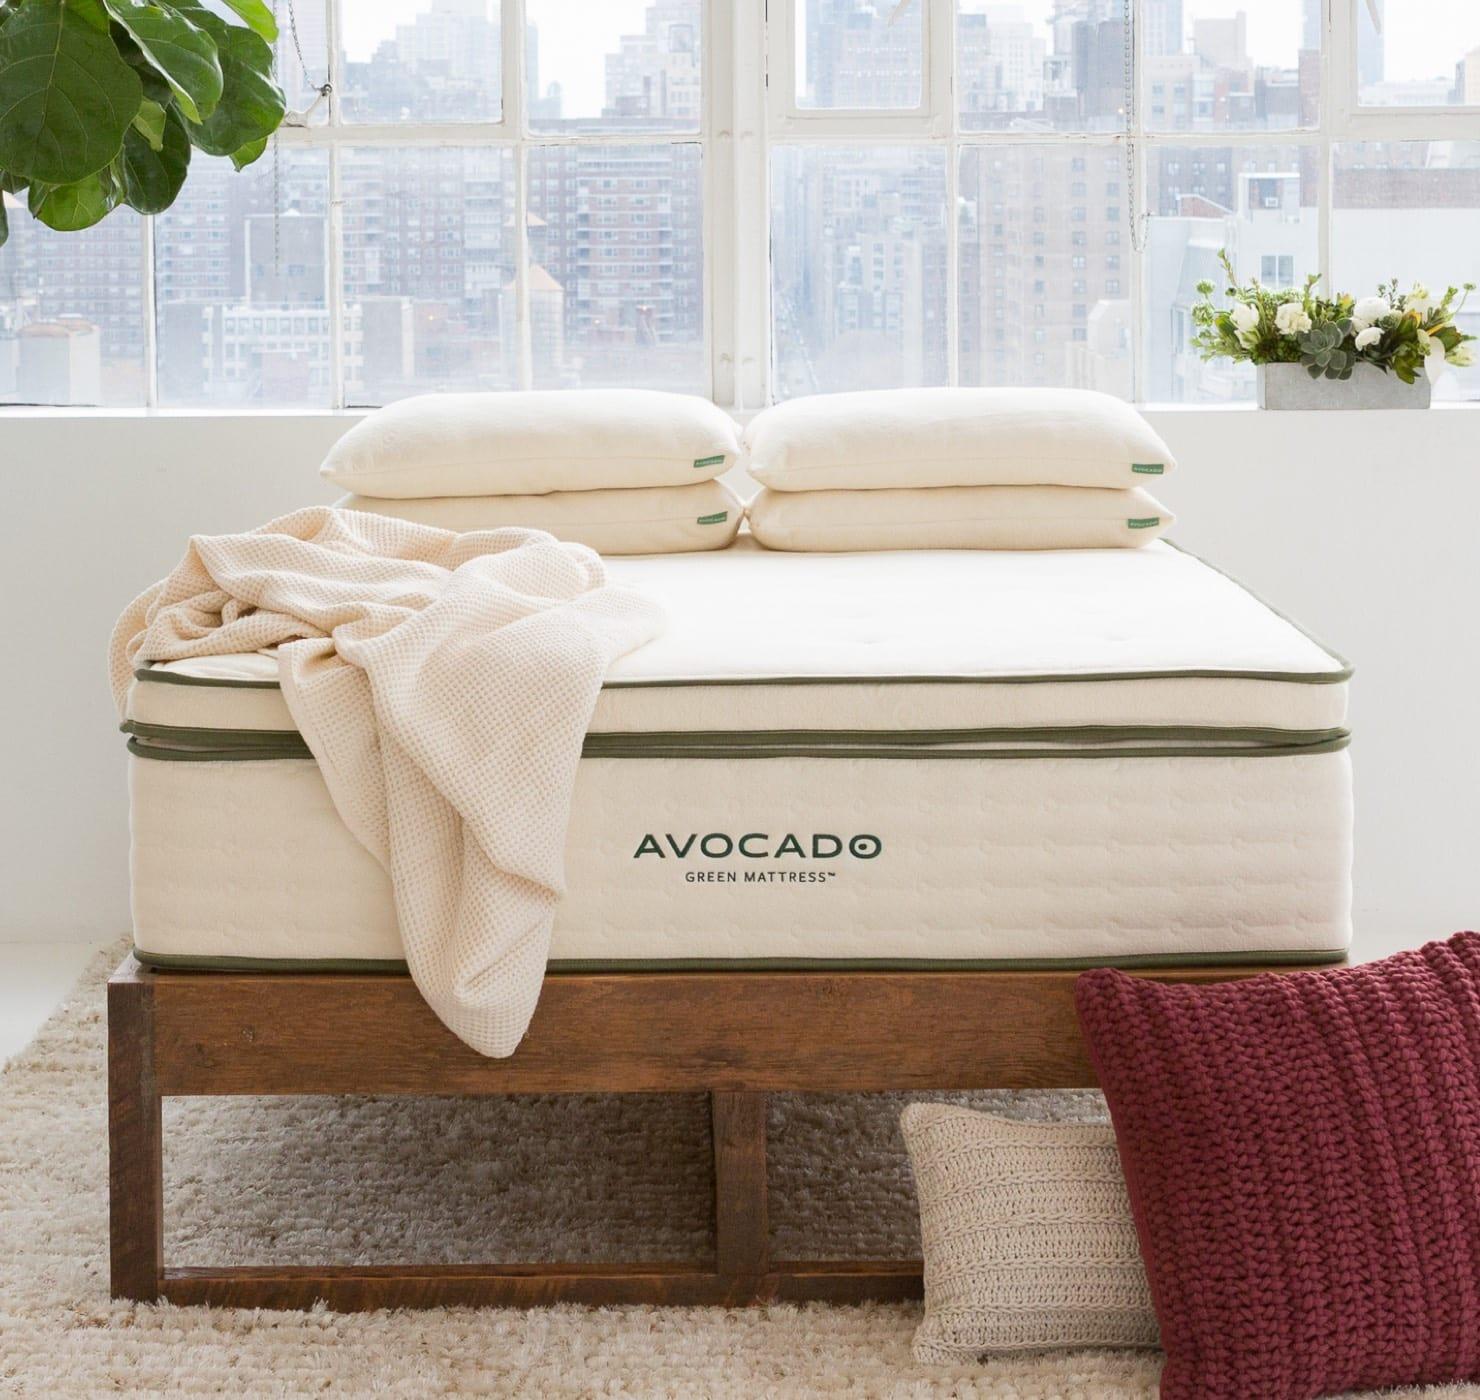 avocado cooling mattress topper